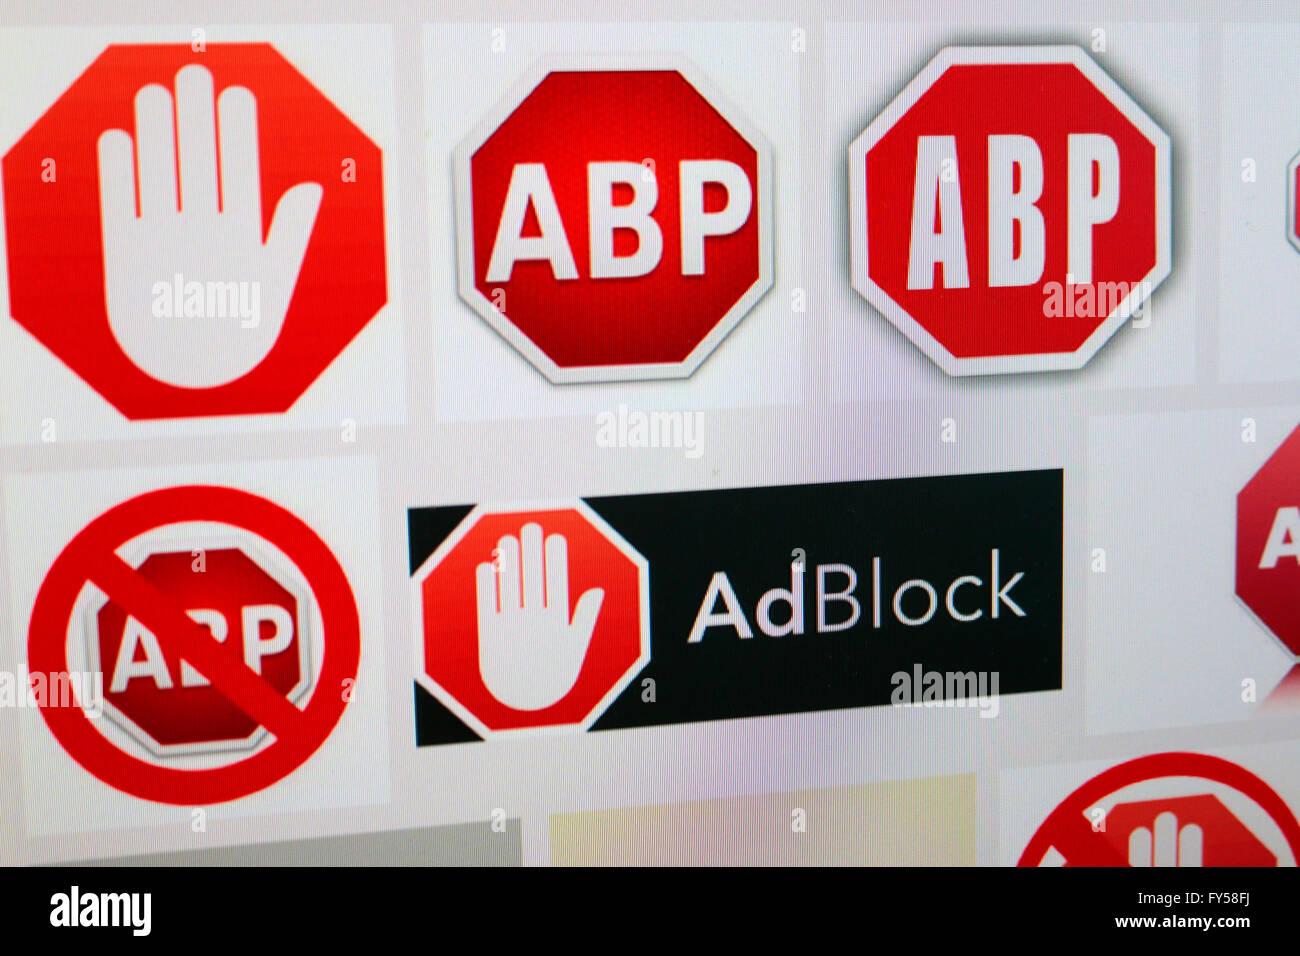 das Logo der Marke 'ABP Adblock', Berlin. - Stock Image